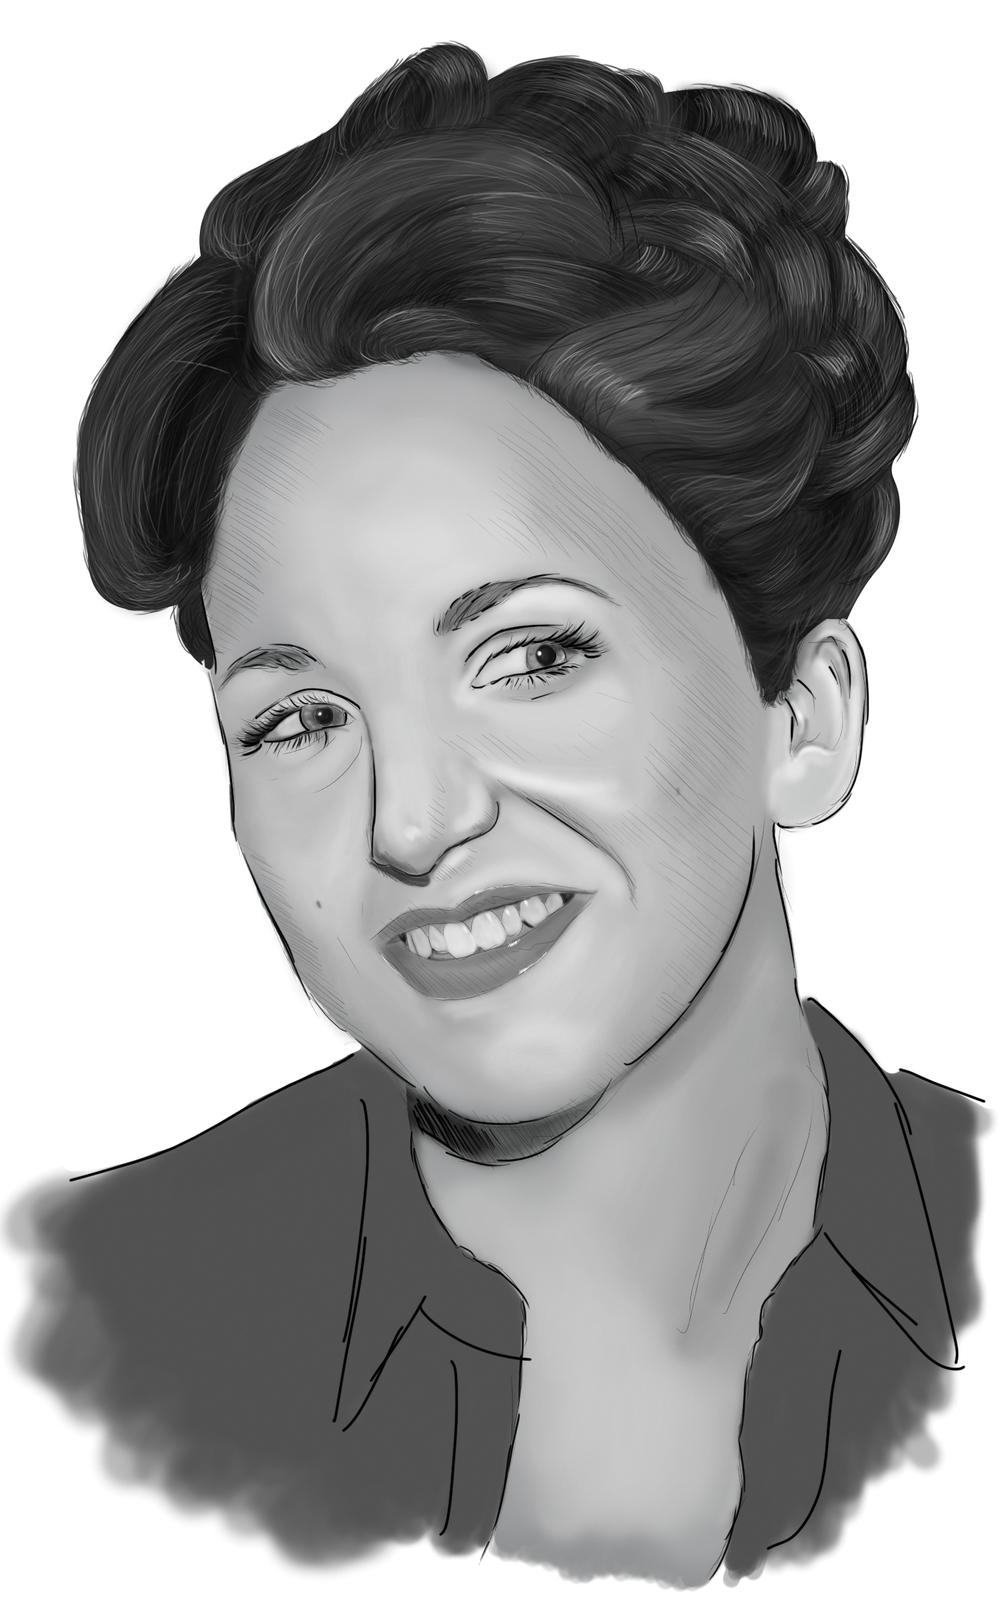 Xania Woodman